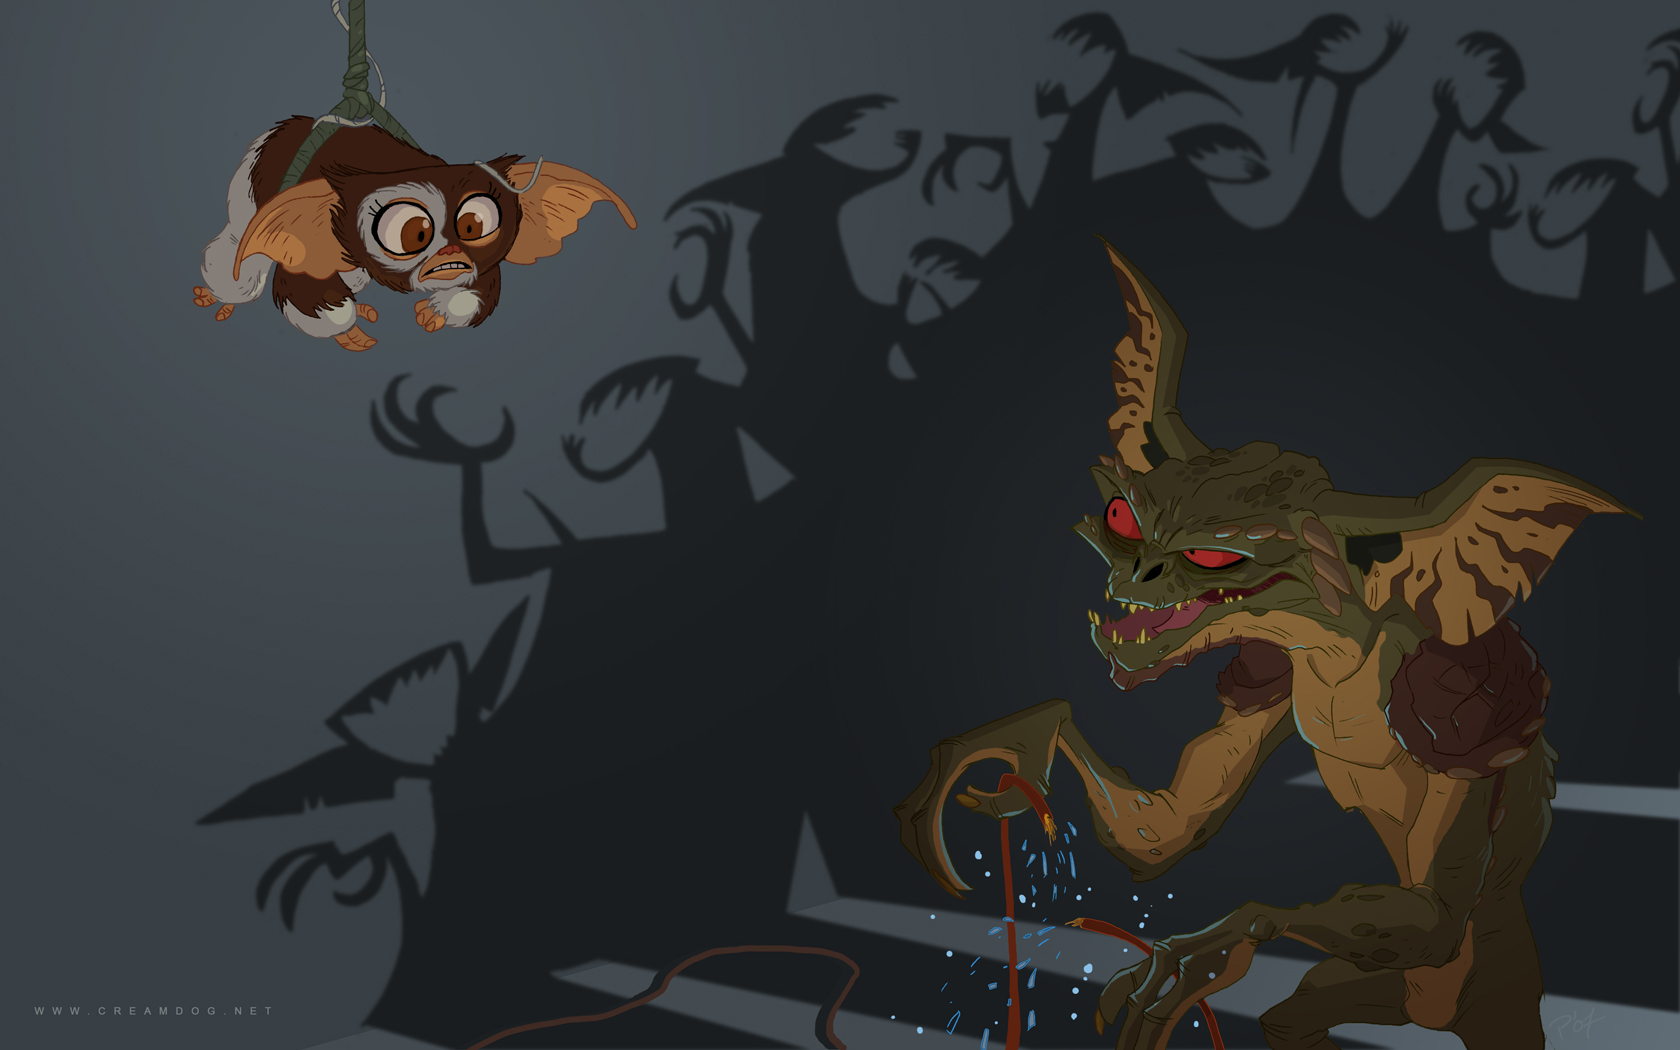 Gremlins Wallpaper